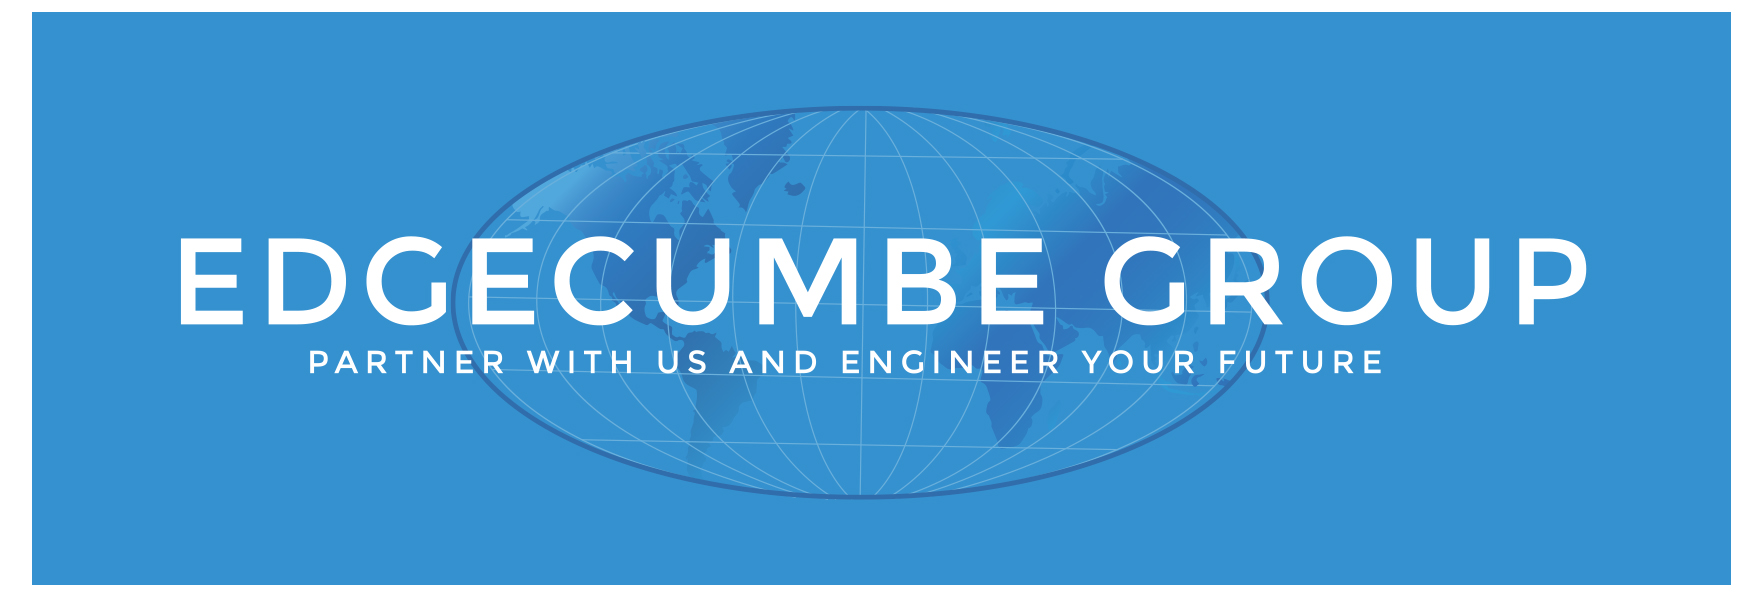 Company Logo Edgecumbe Group